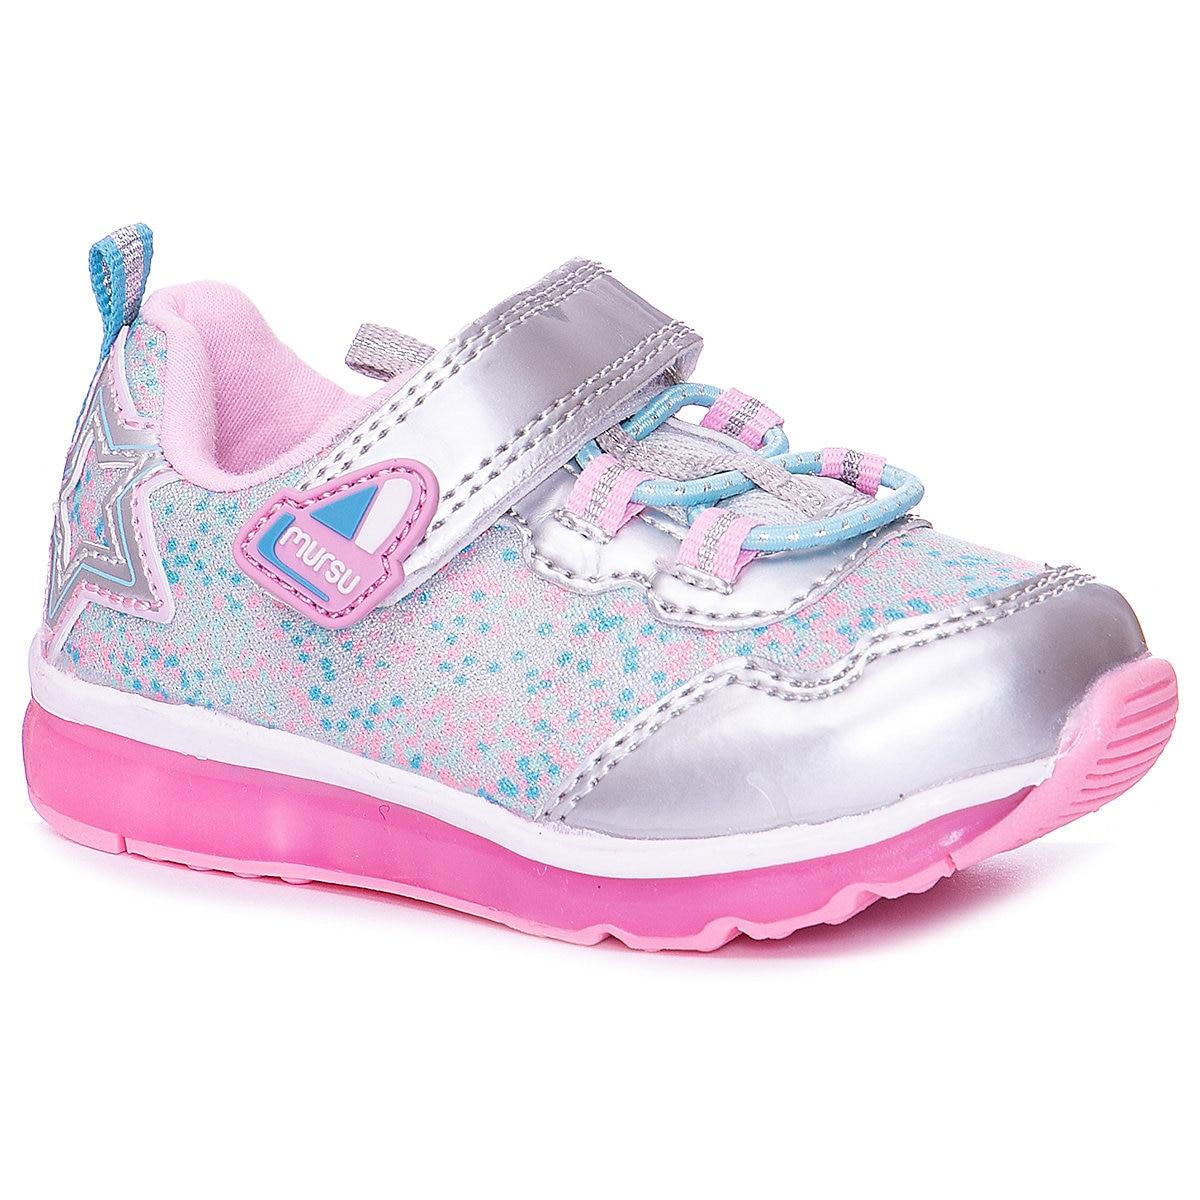 MURSU Kids\' Sneakers 10612147 10612157 Children\'s Sports Running Shoes Spring Autumn Girls Girl MTpromo